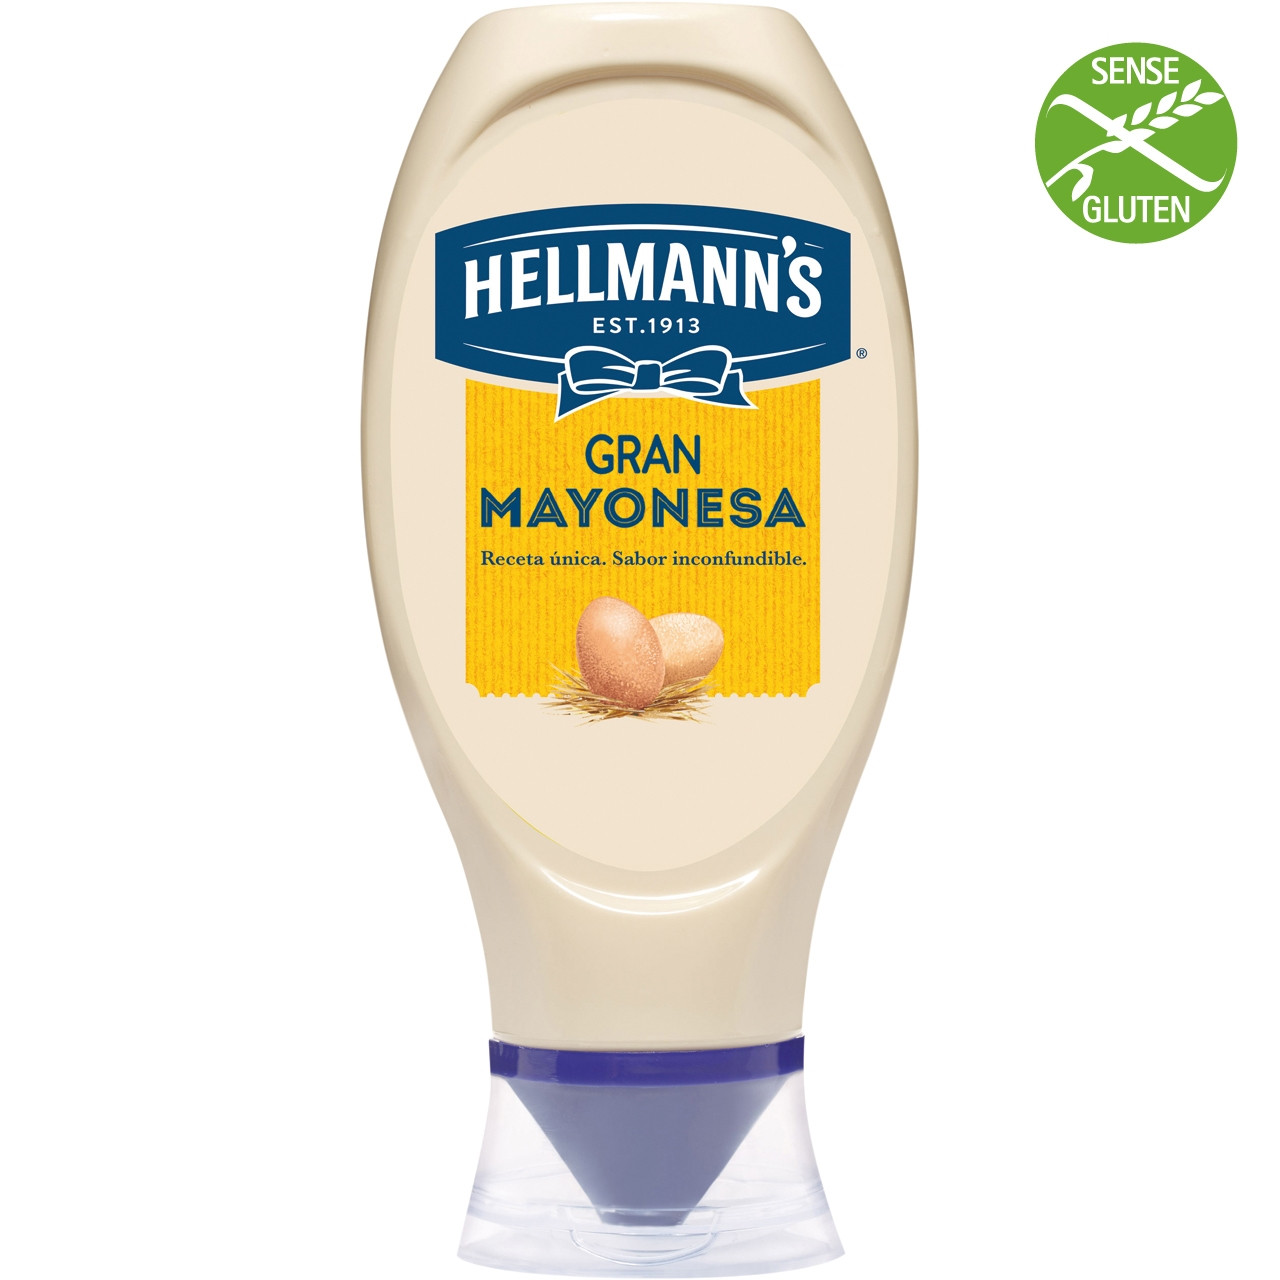 Maionesa Hellmann's bocabajo